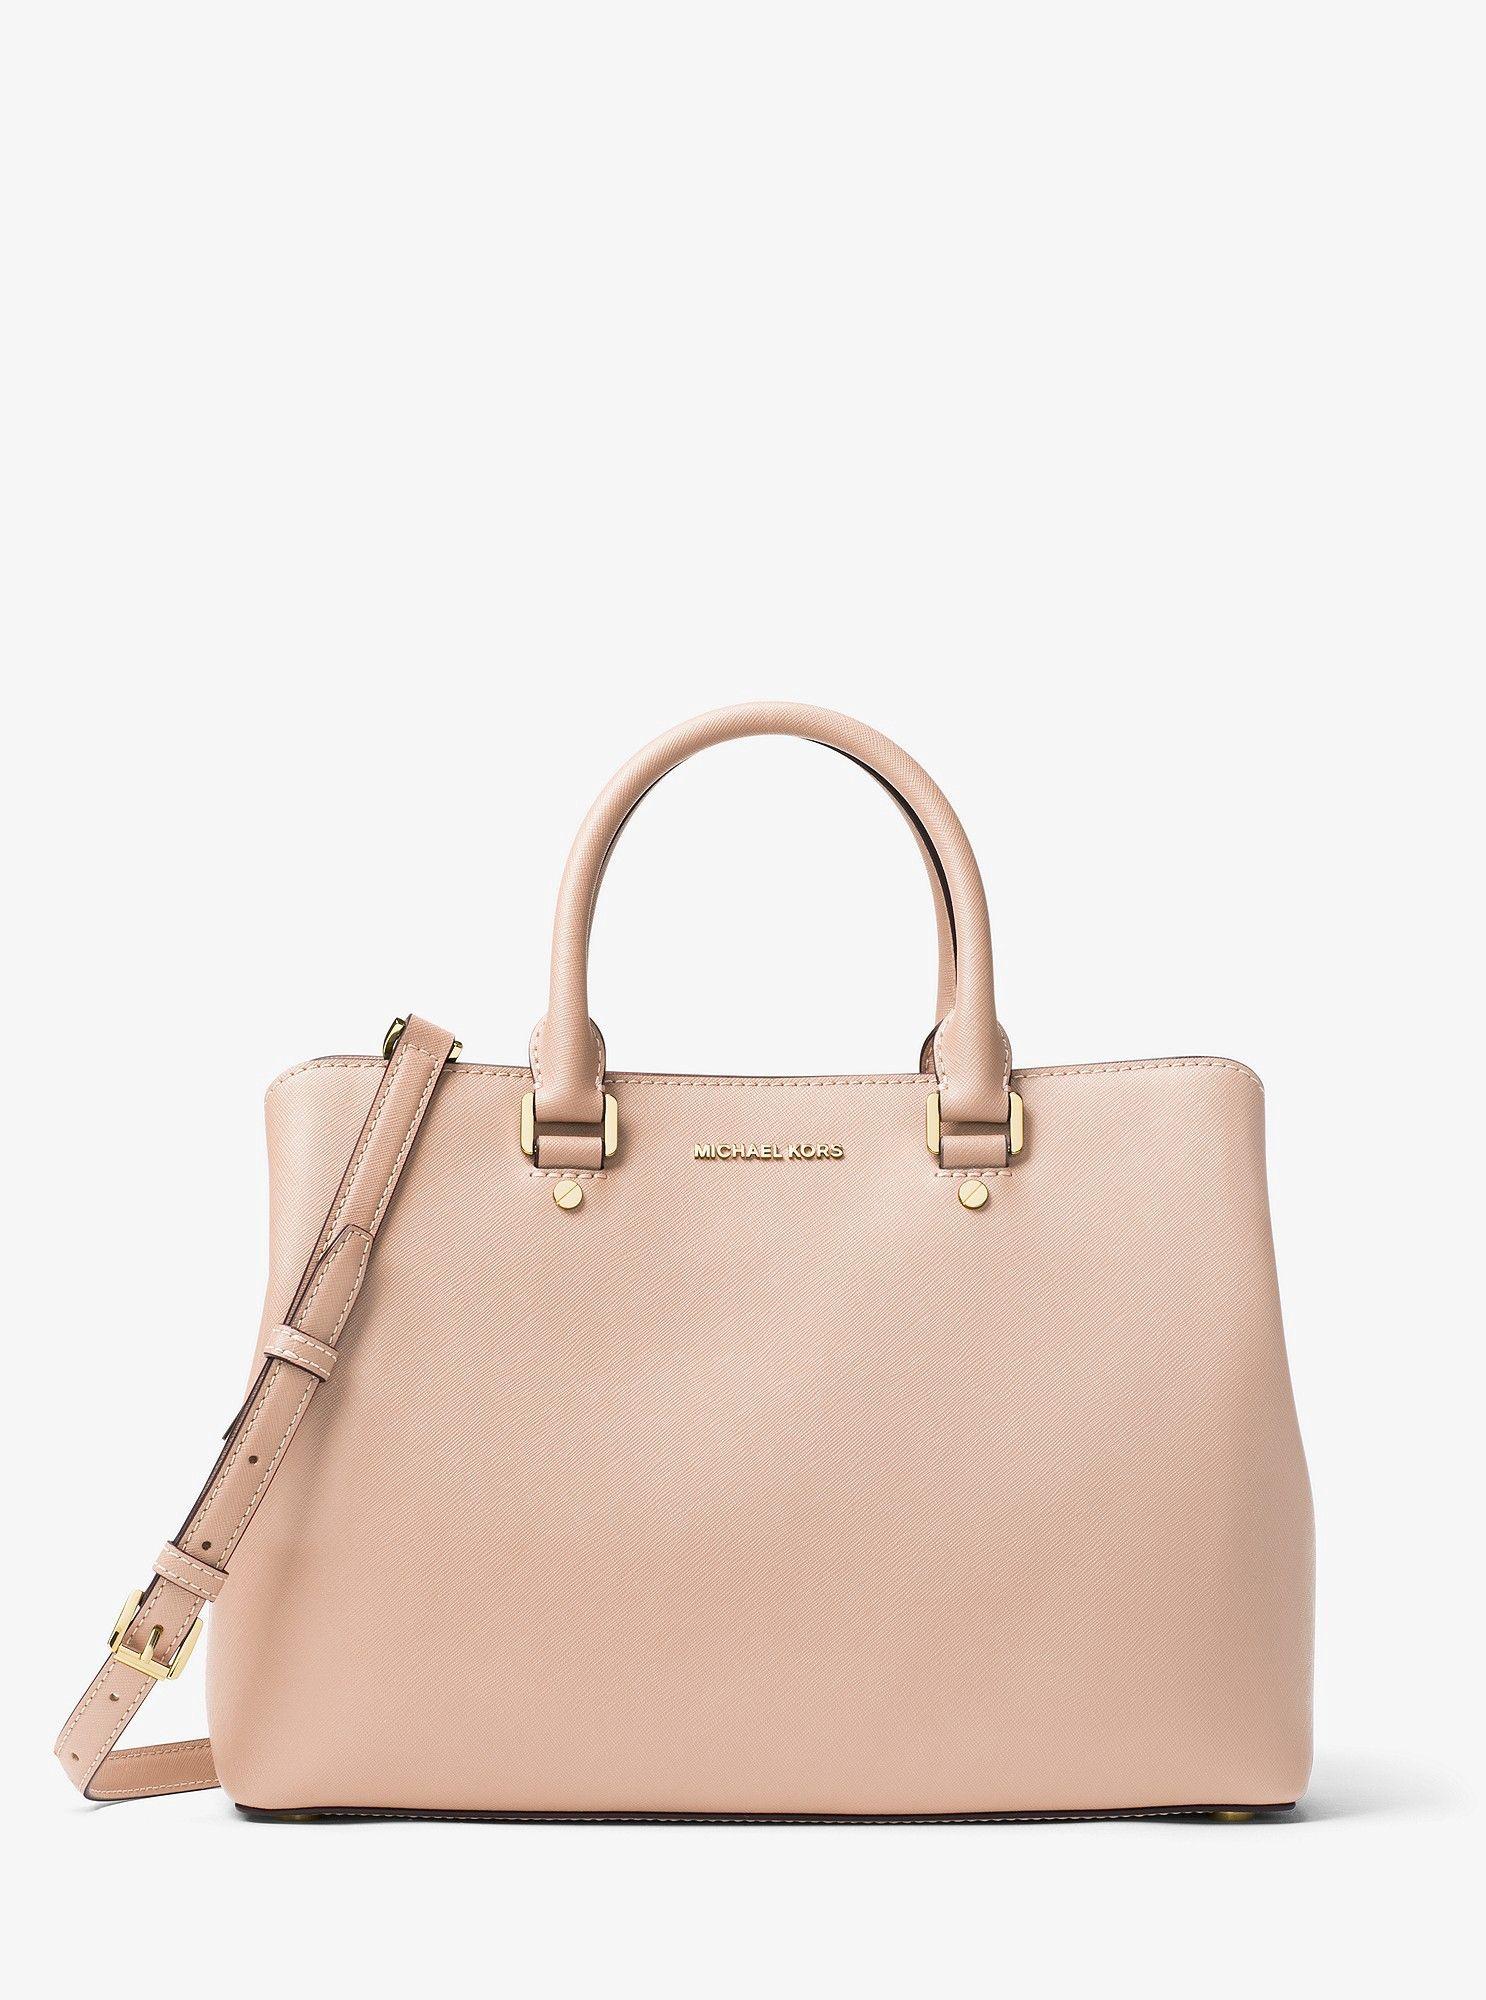 9b912cd970e Michael Kors Savannah Large Saffiano Leather Satchel - Soft Pink ...